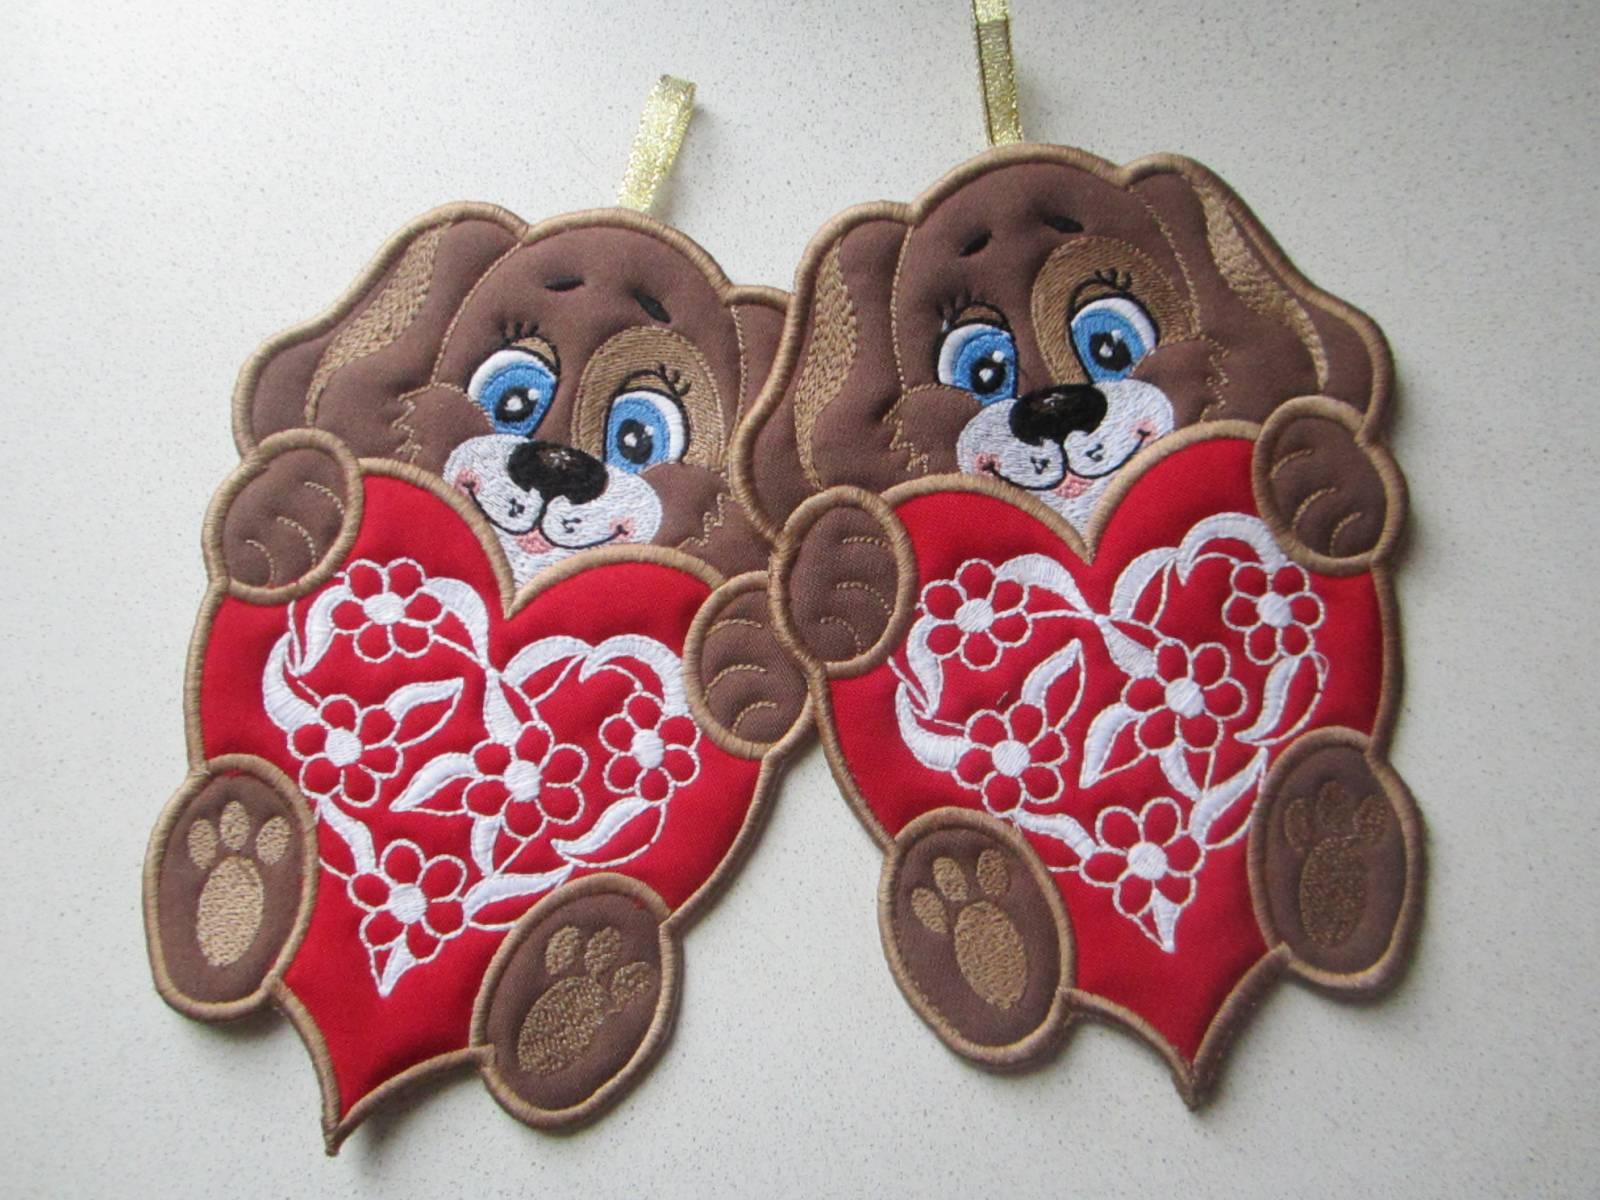 Conversation hearts applique digistitches machine embroidery designs